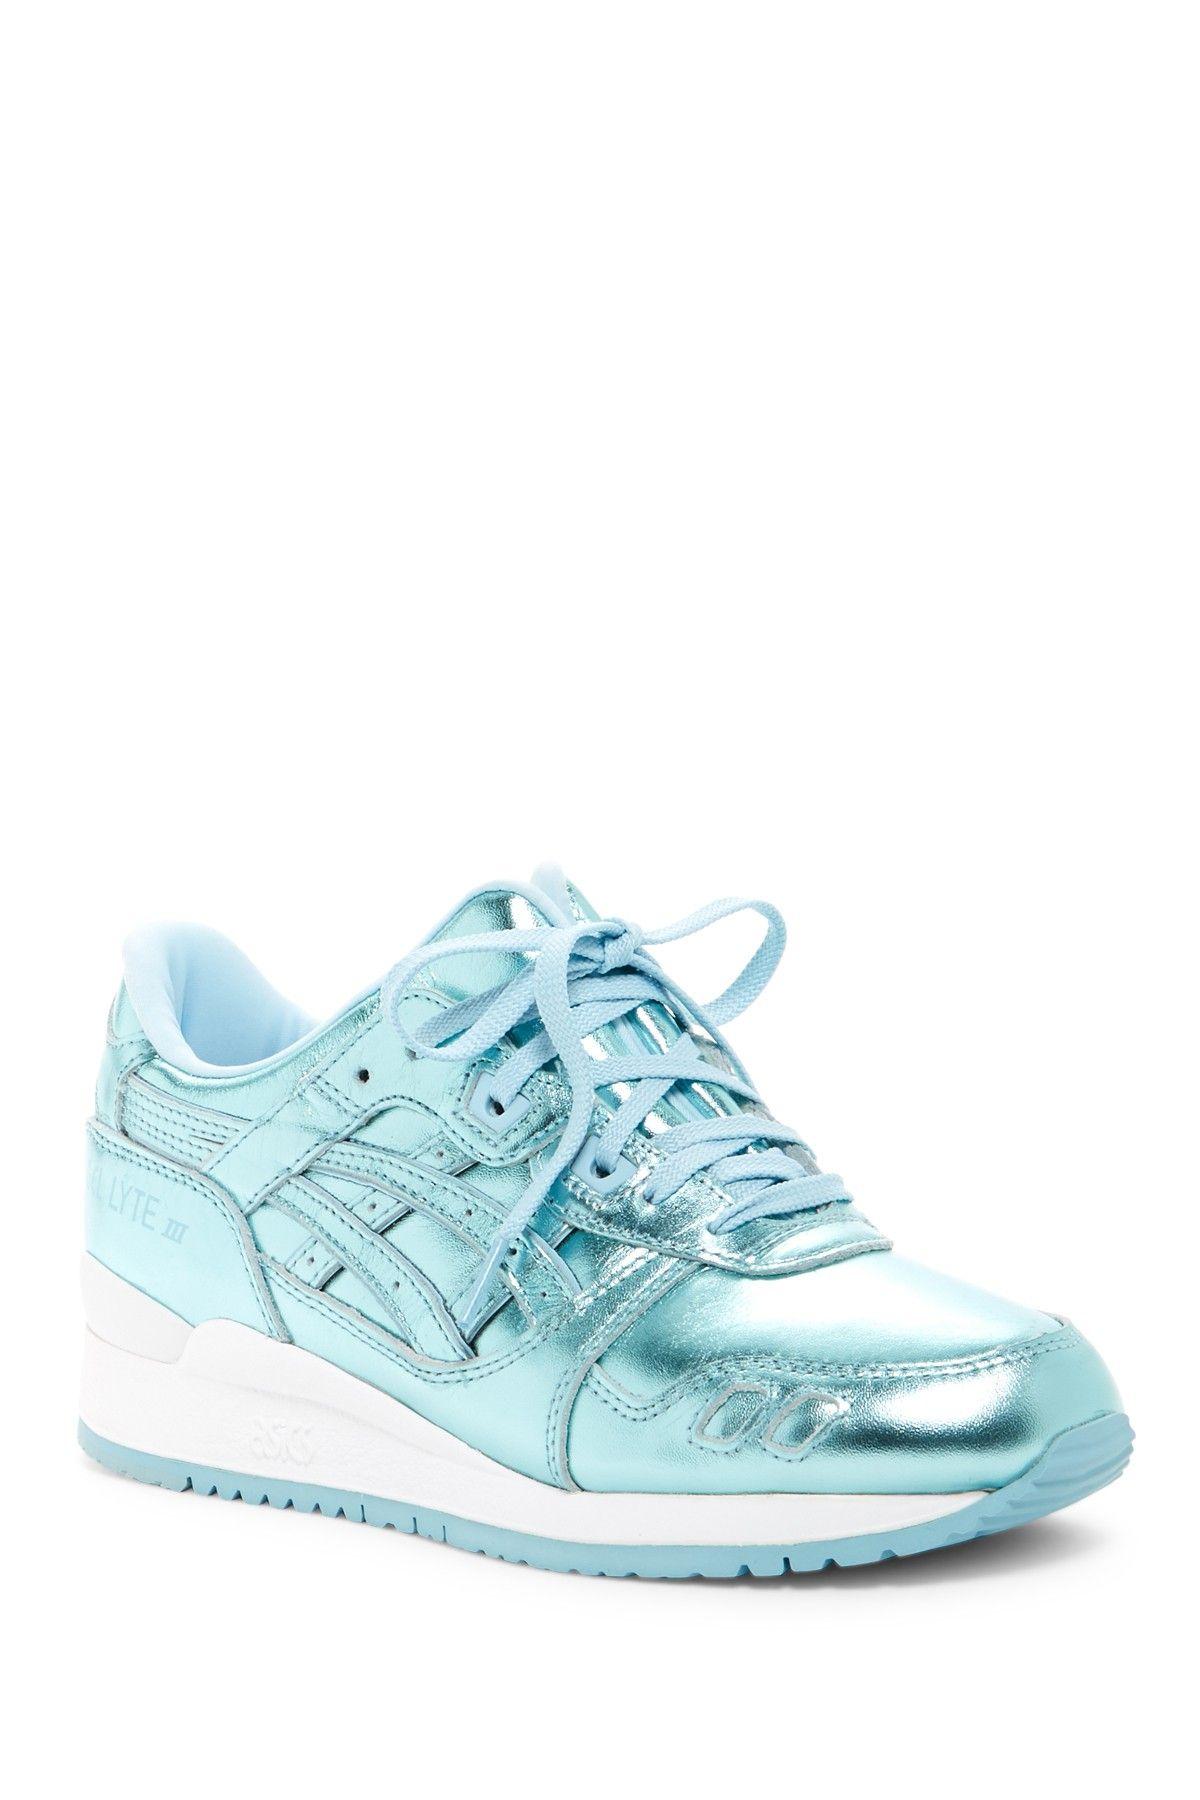 huge discount 6c21b 9fa1b ASICS | GEL Lyte III Sneaker | Products | Asics gel lyte iii ...